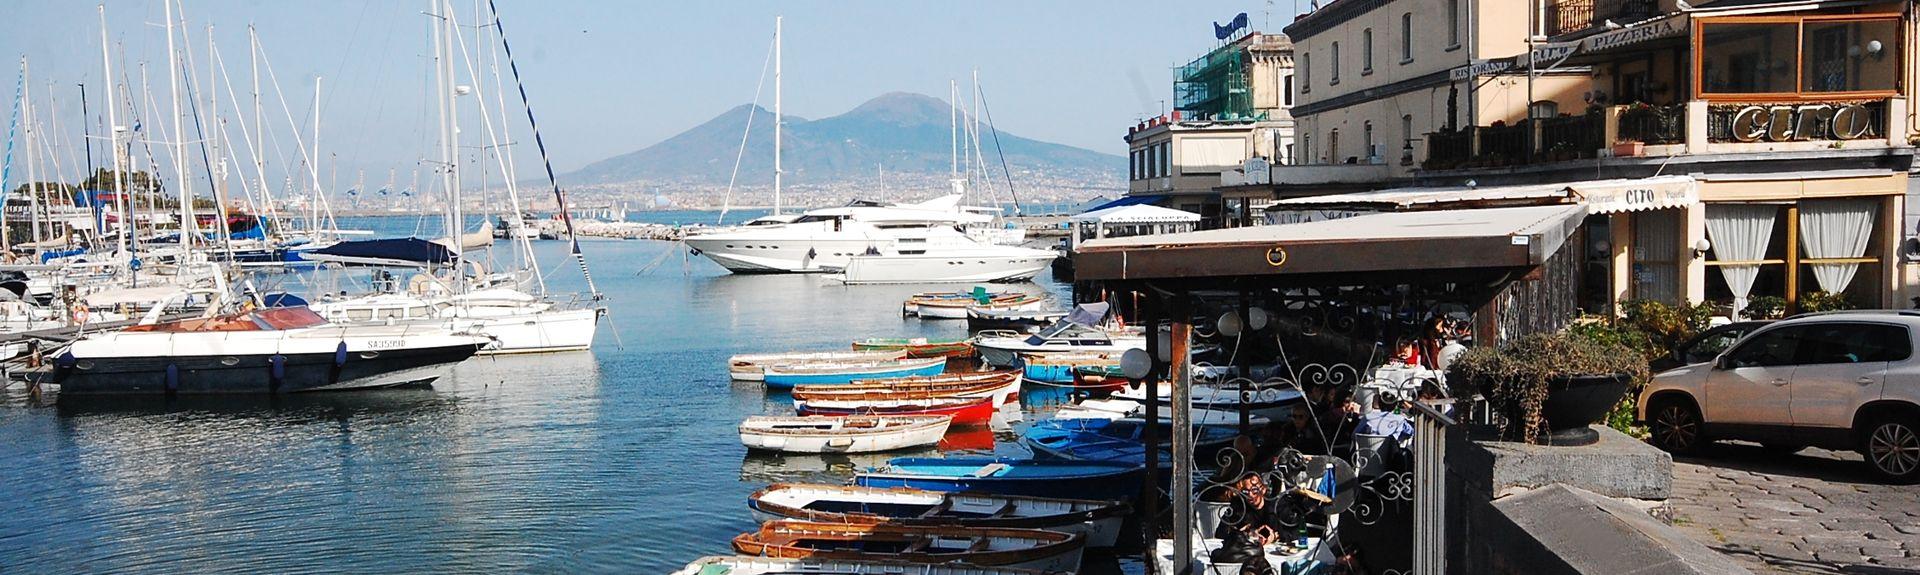 San Ferdinando, Naples, Itália